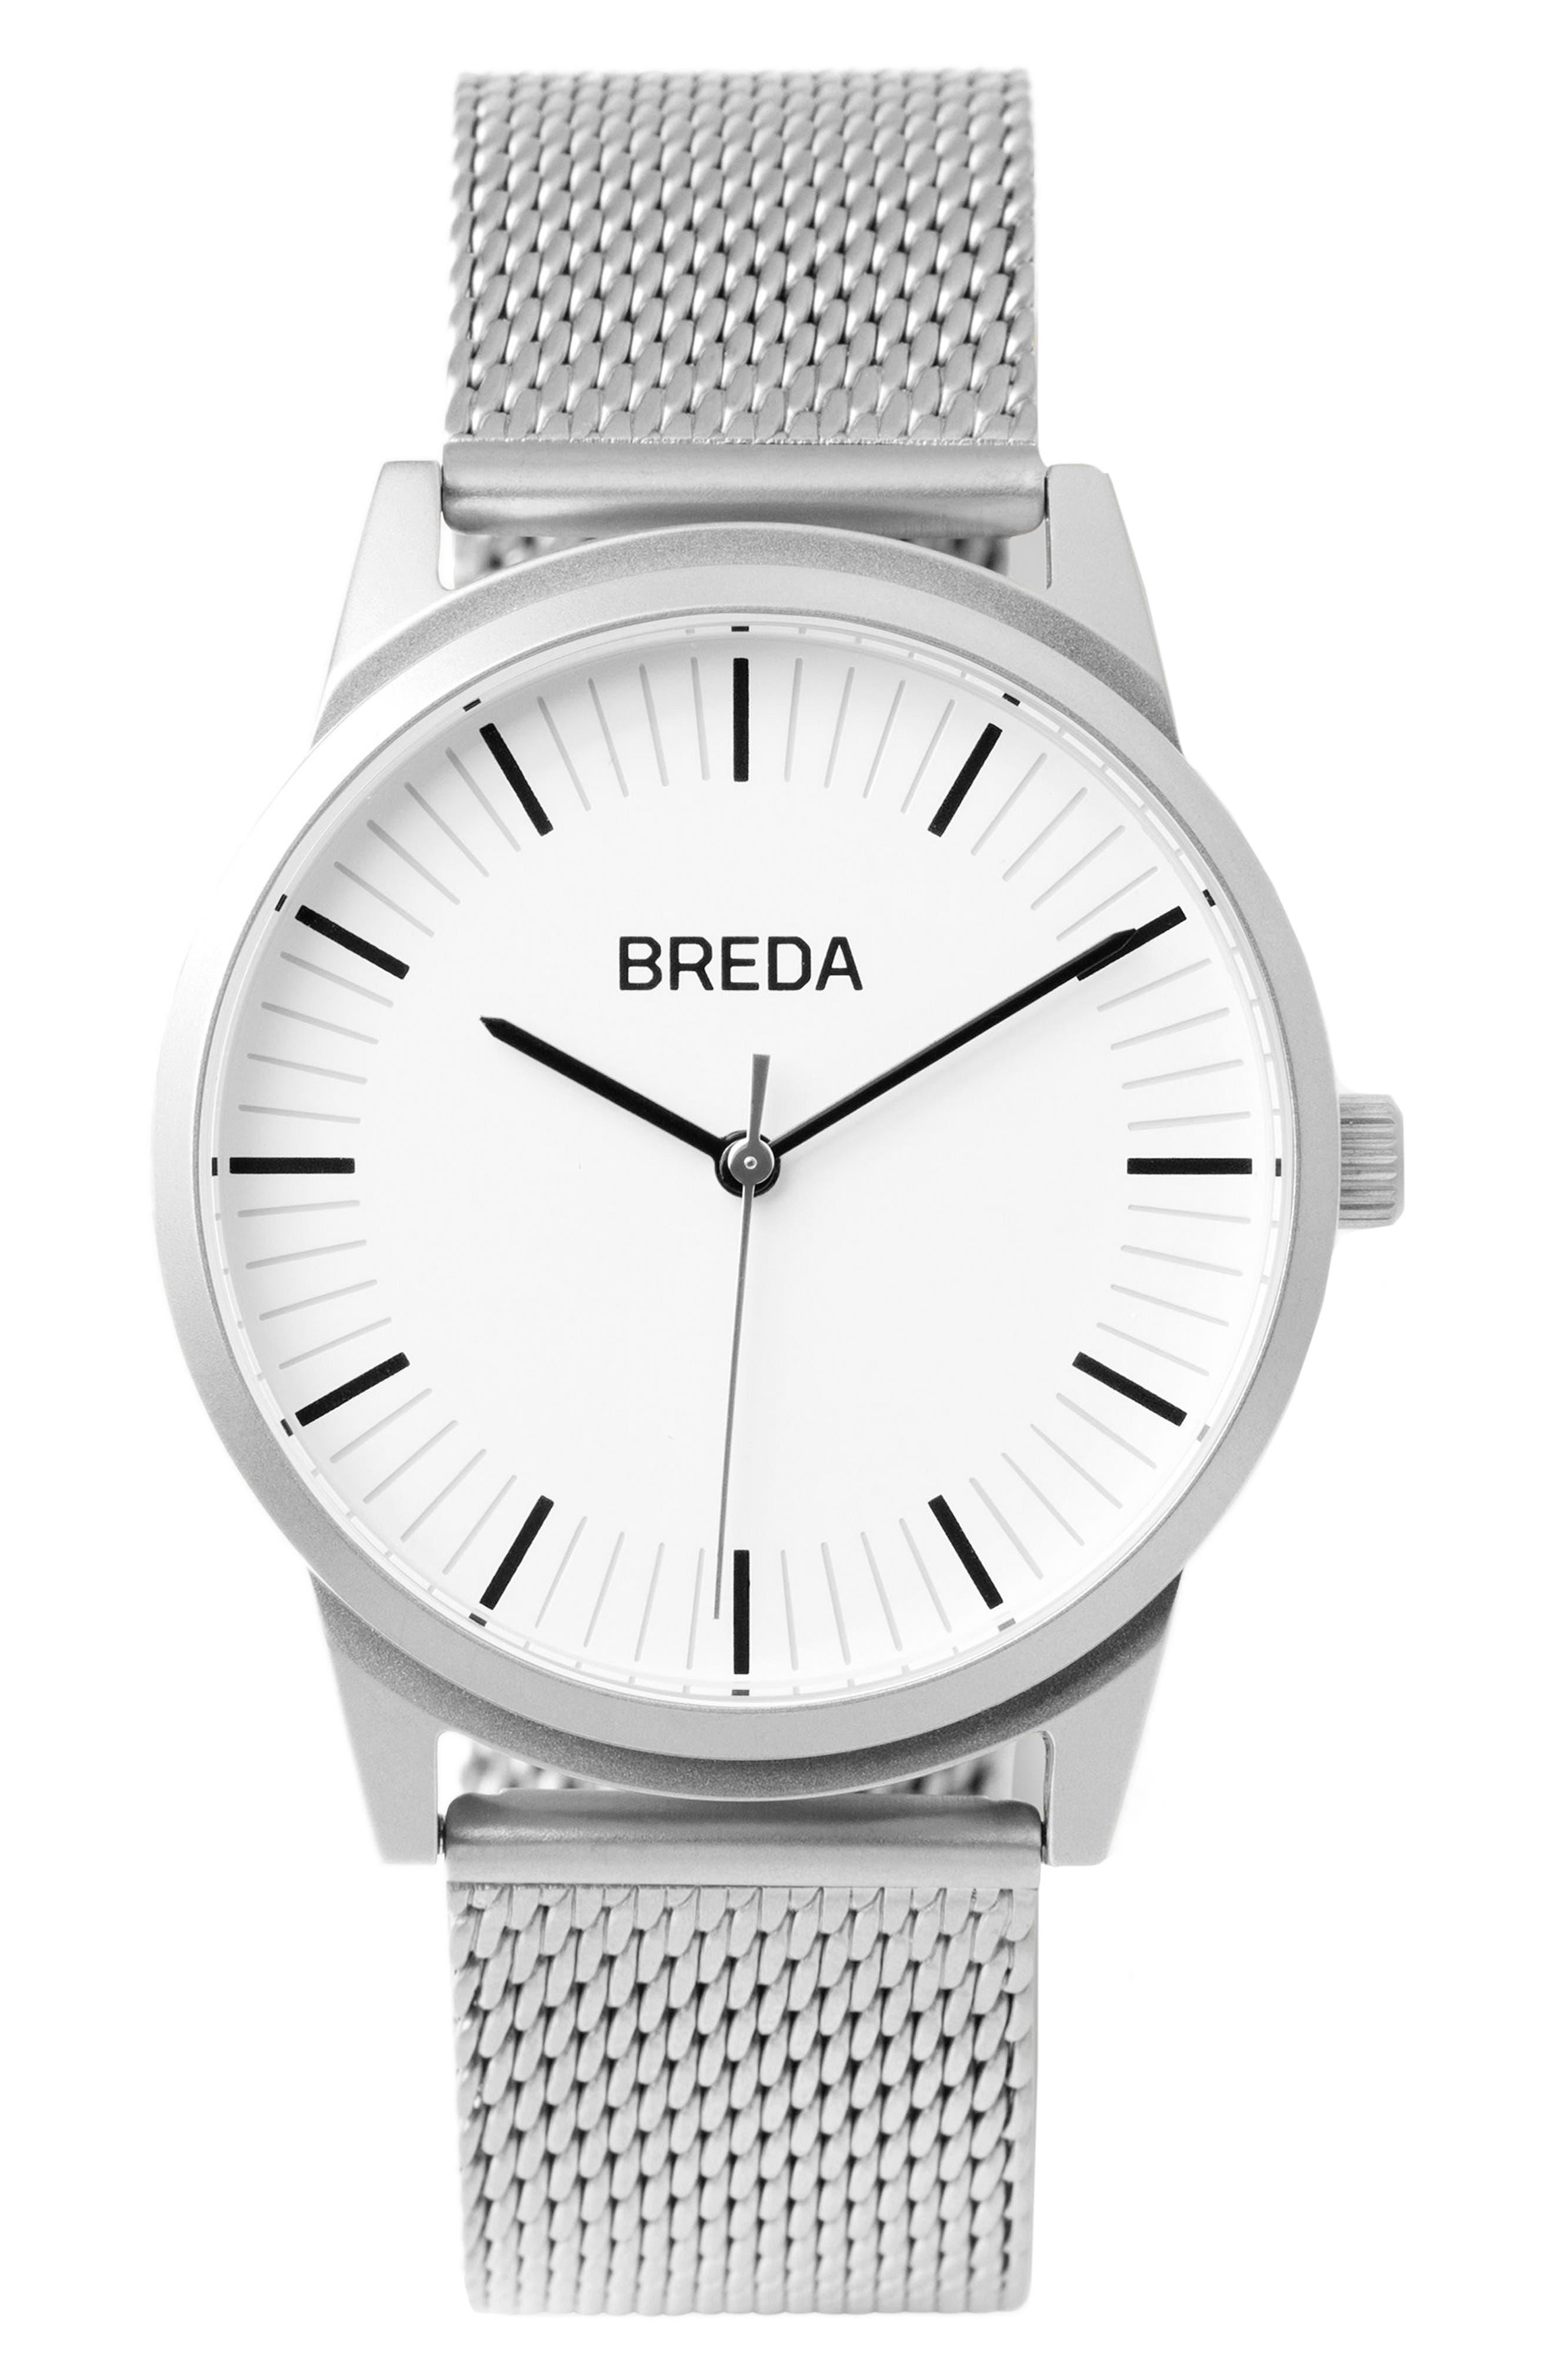 Main Image - BREDA Bresson Mesh Strap Watch, 39mm